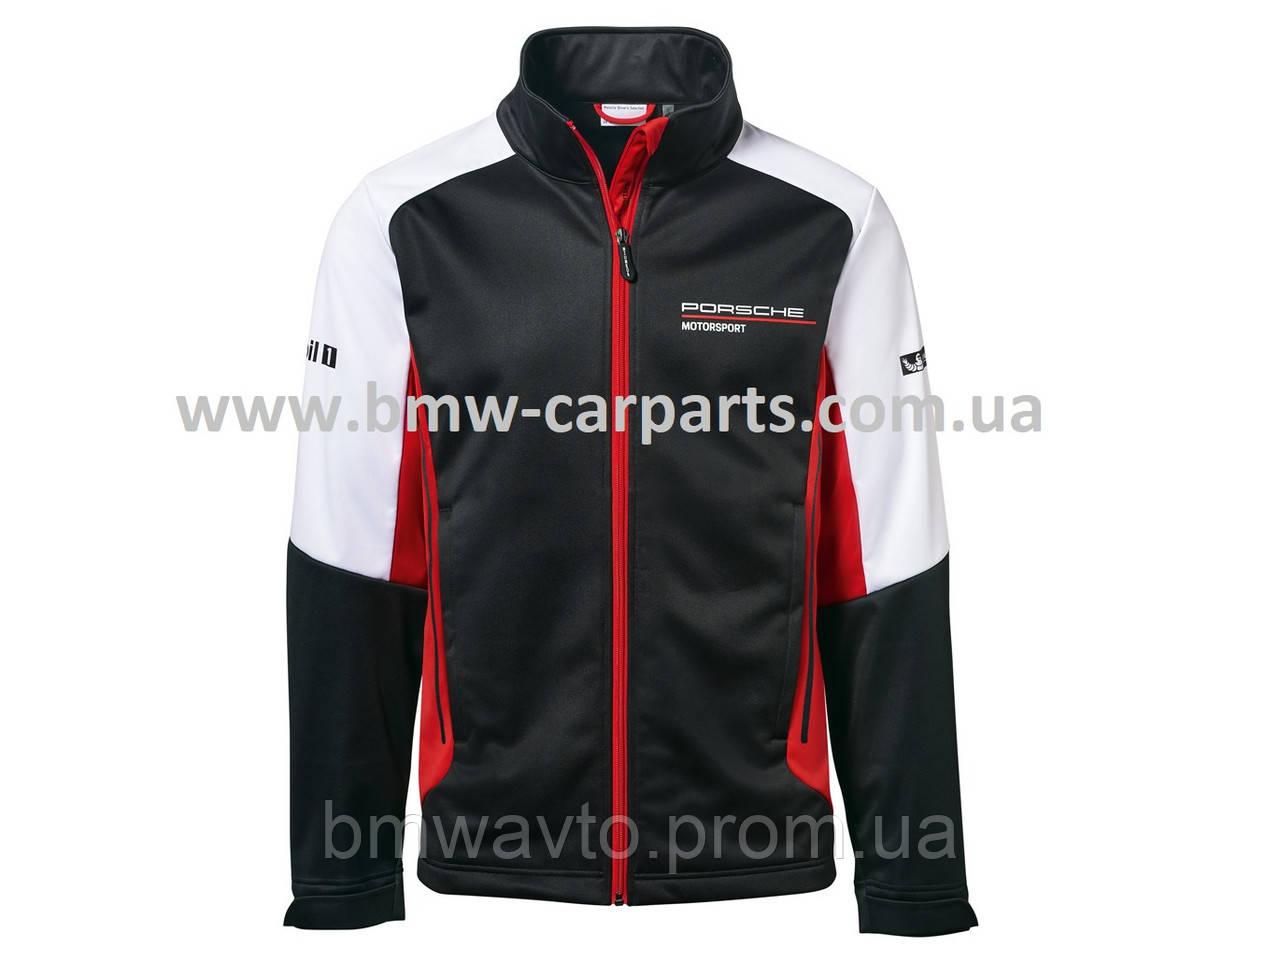 Легкая мужская куртка Porsche Men's Soft Shell Jacket, Motorsport